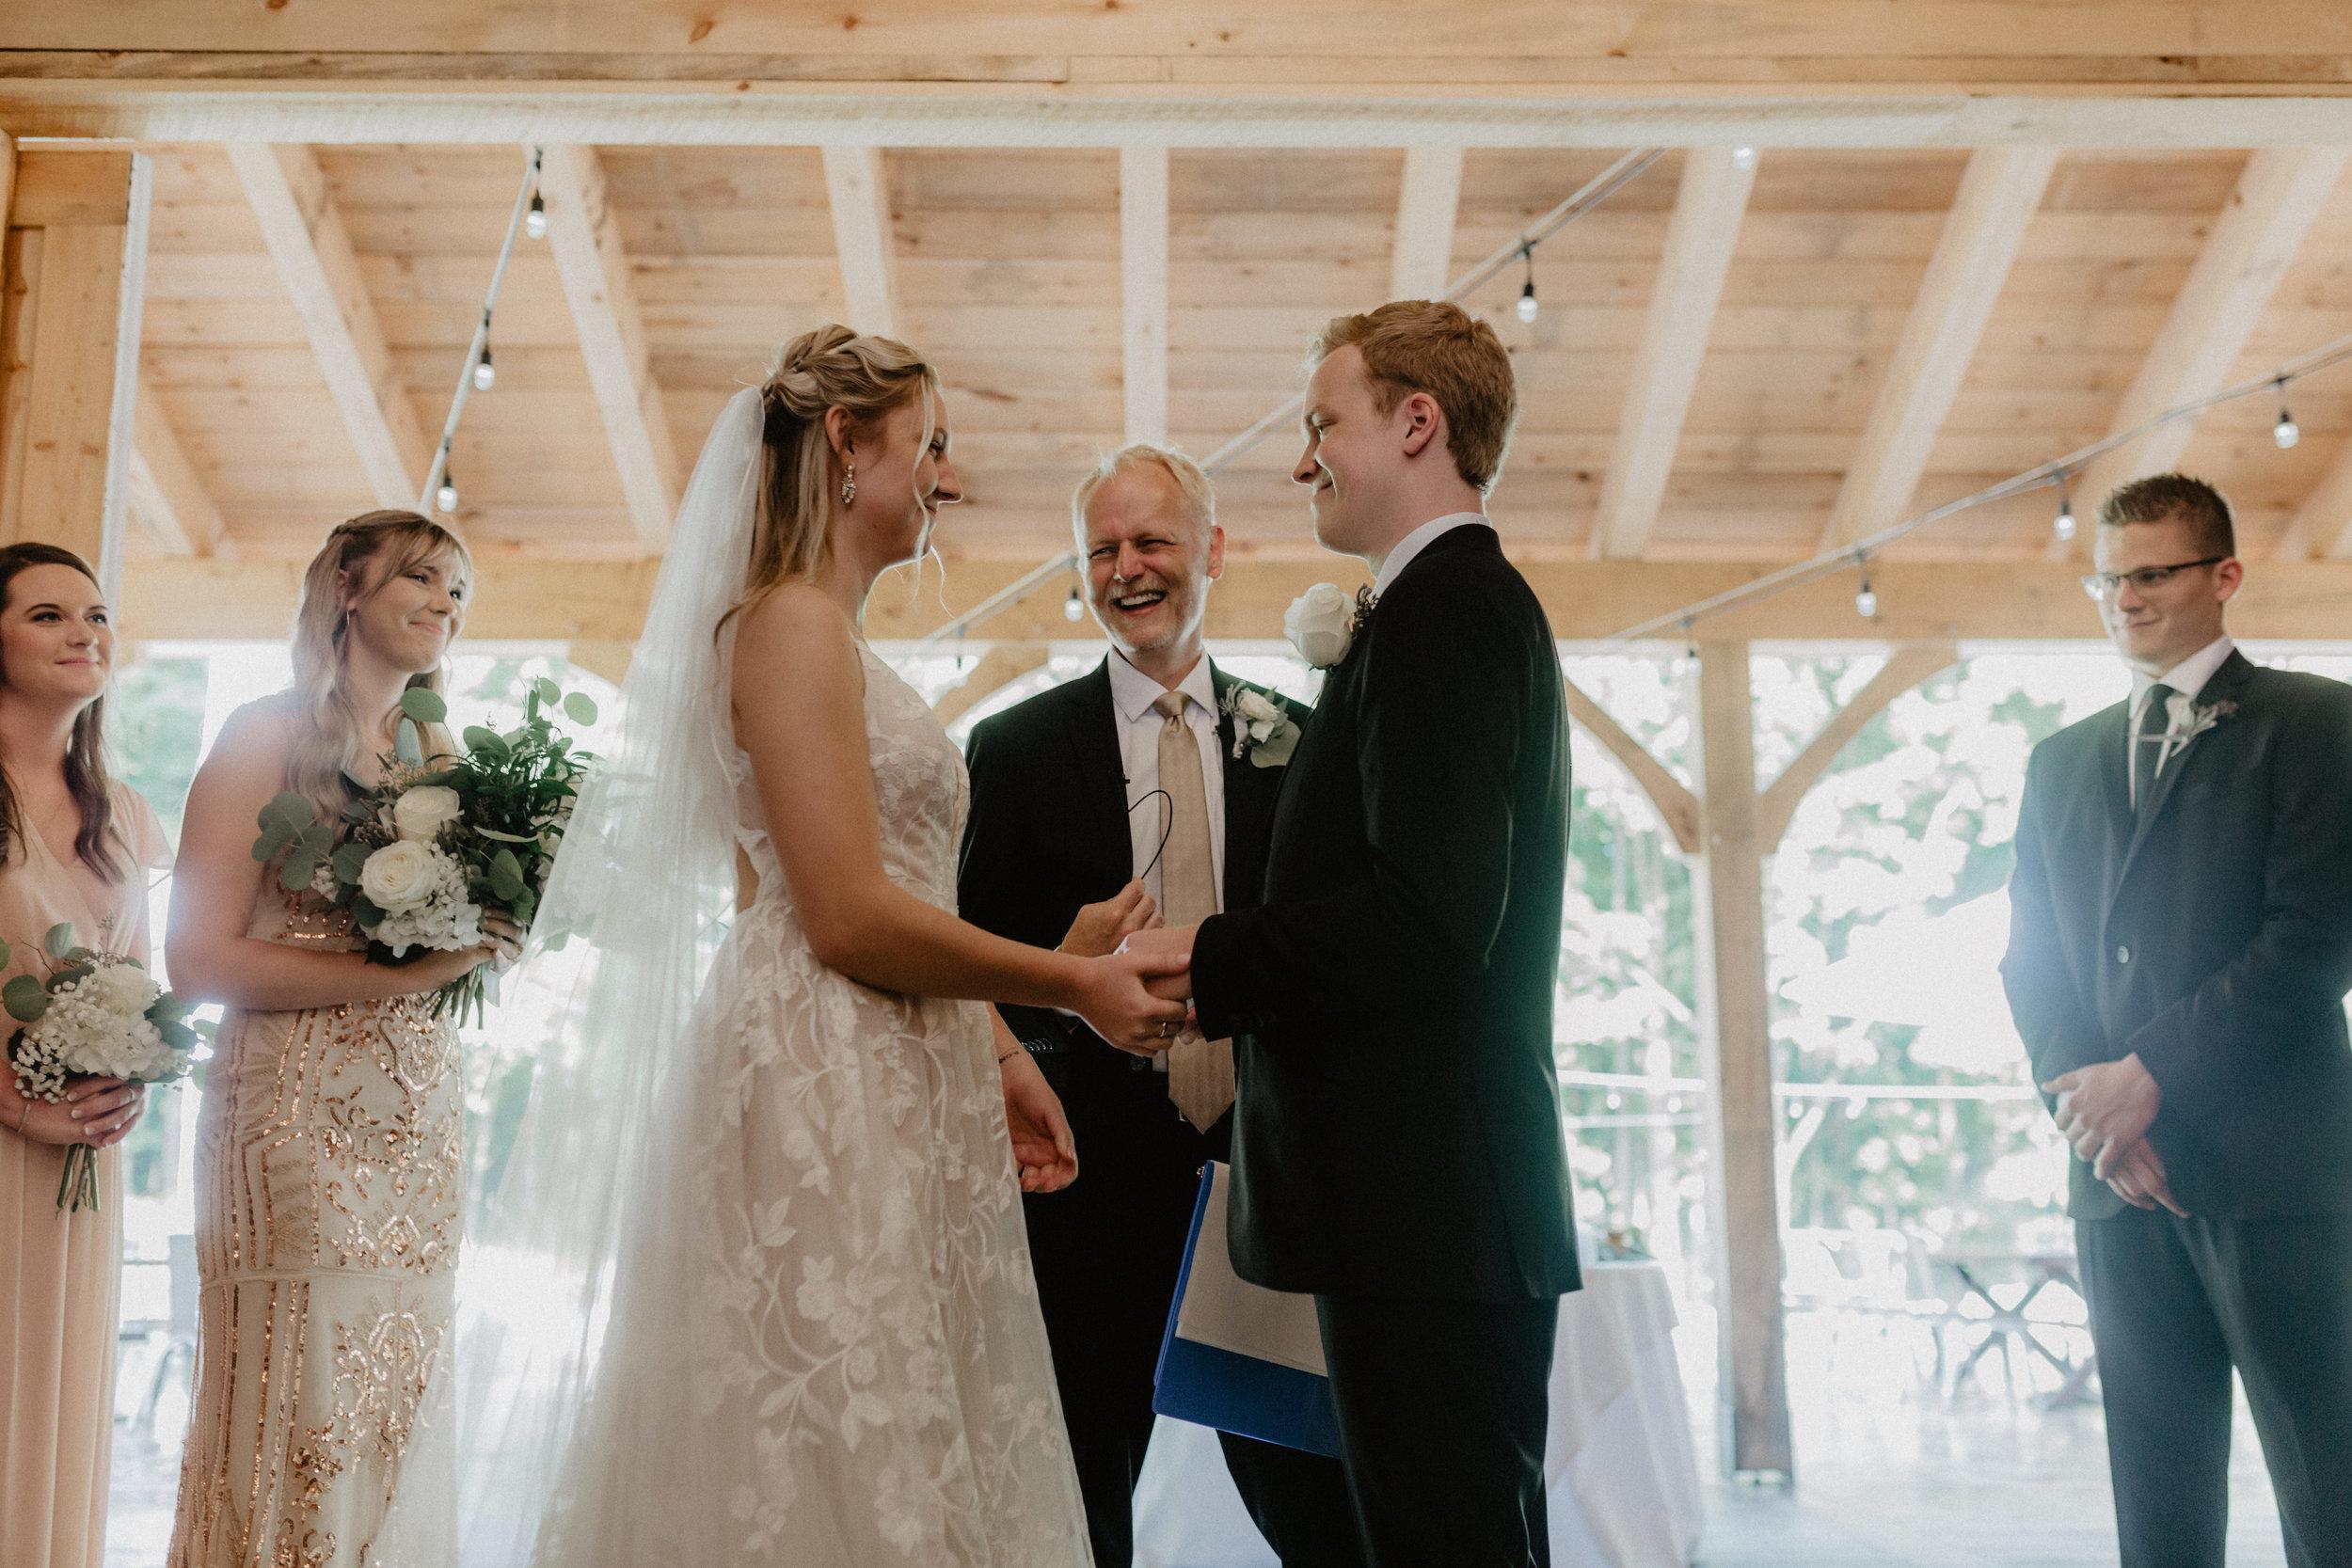 greywacke-meadows-wedding-41.jpg